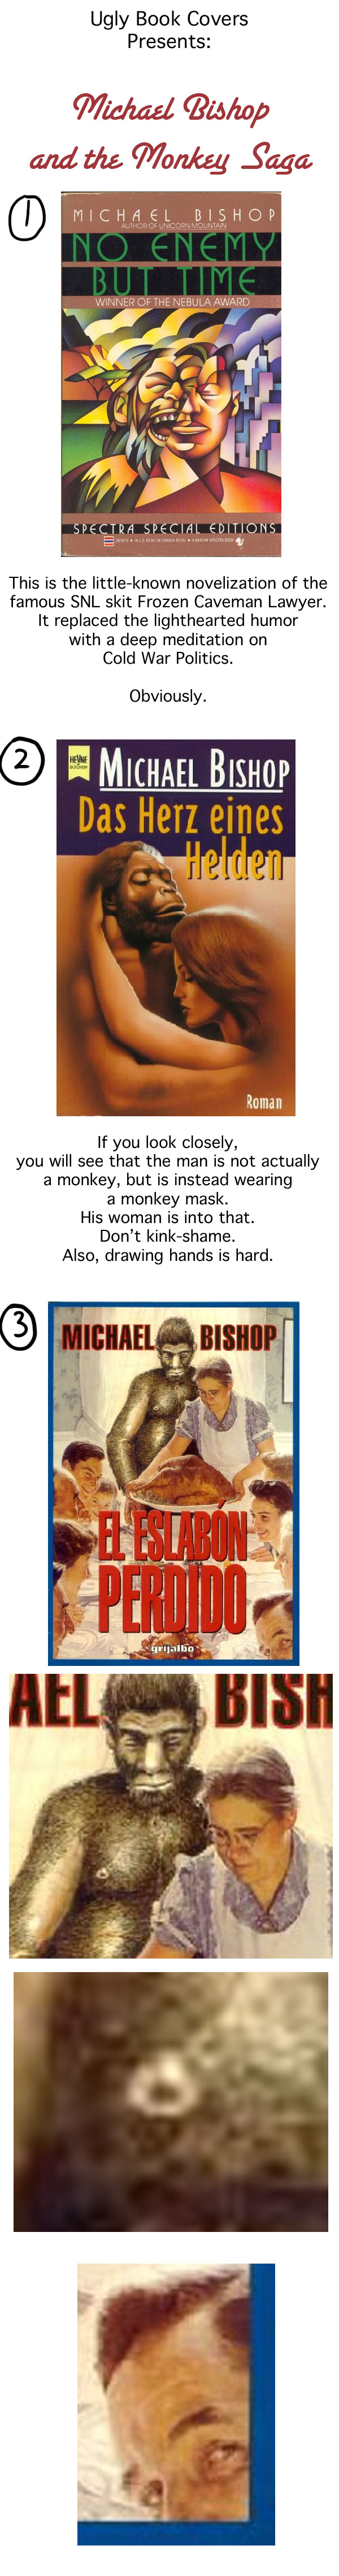 Michael Bishop Loves Monkeys